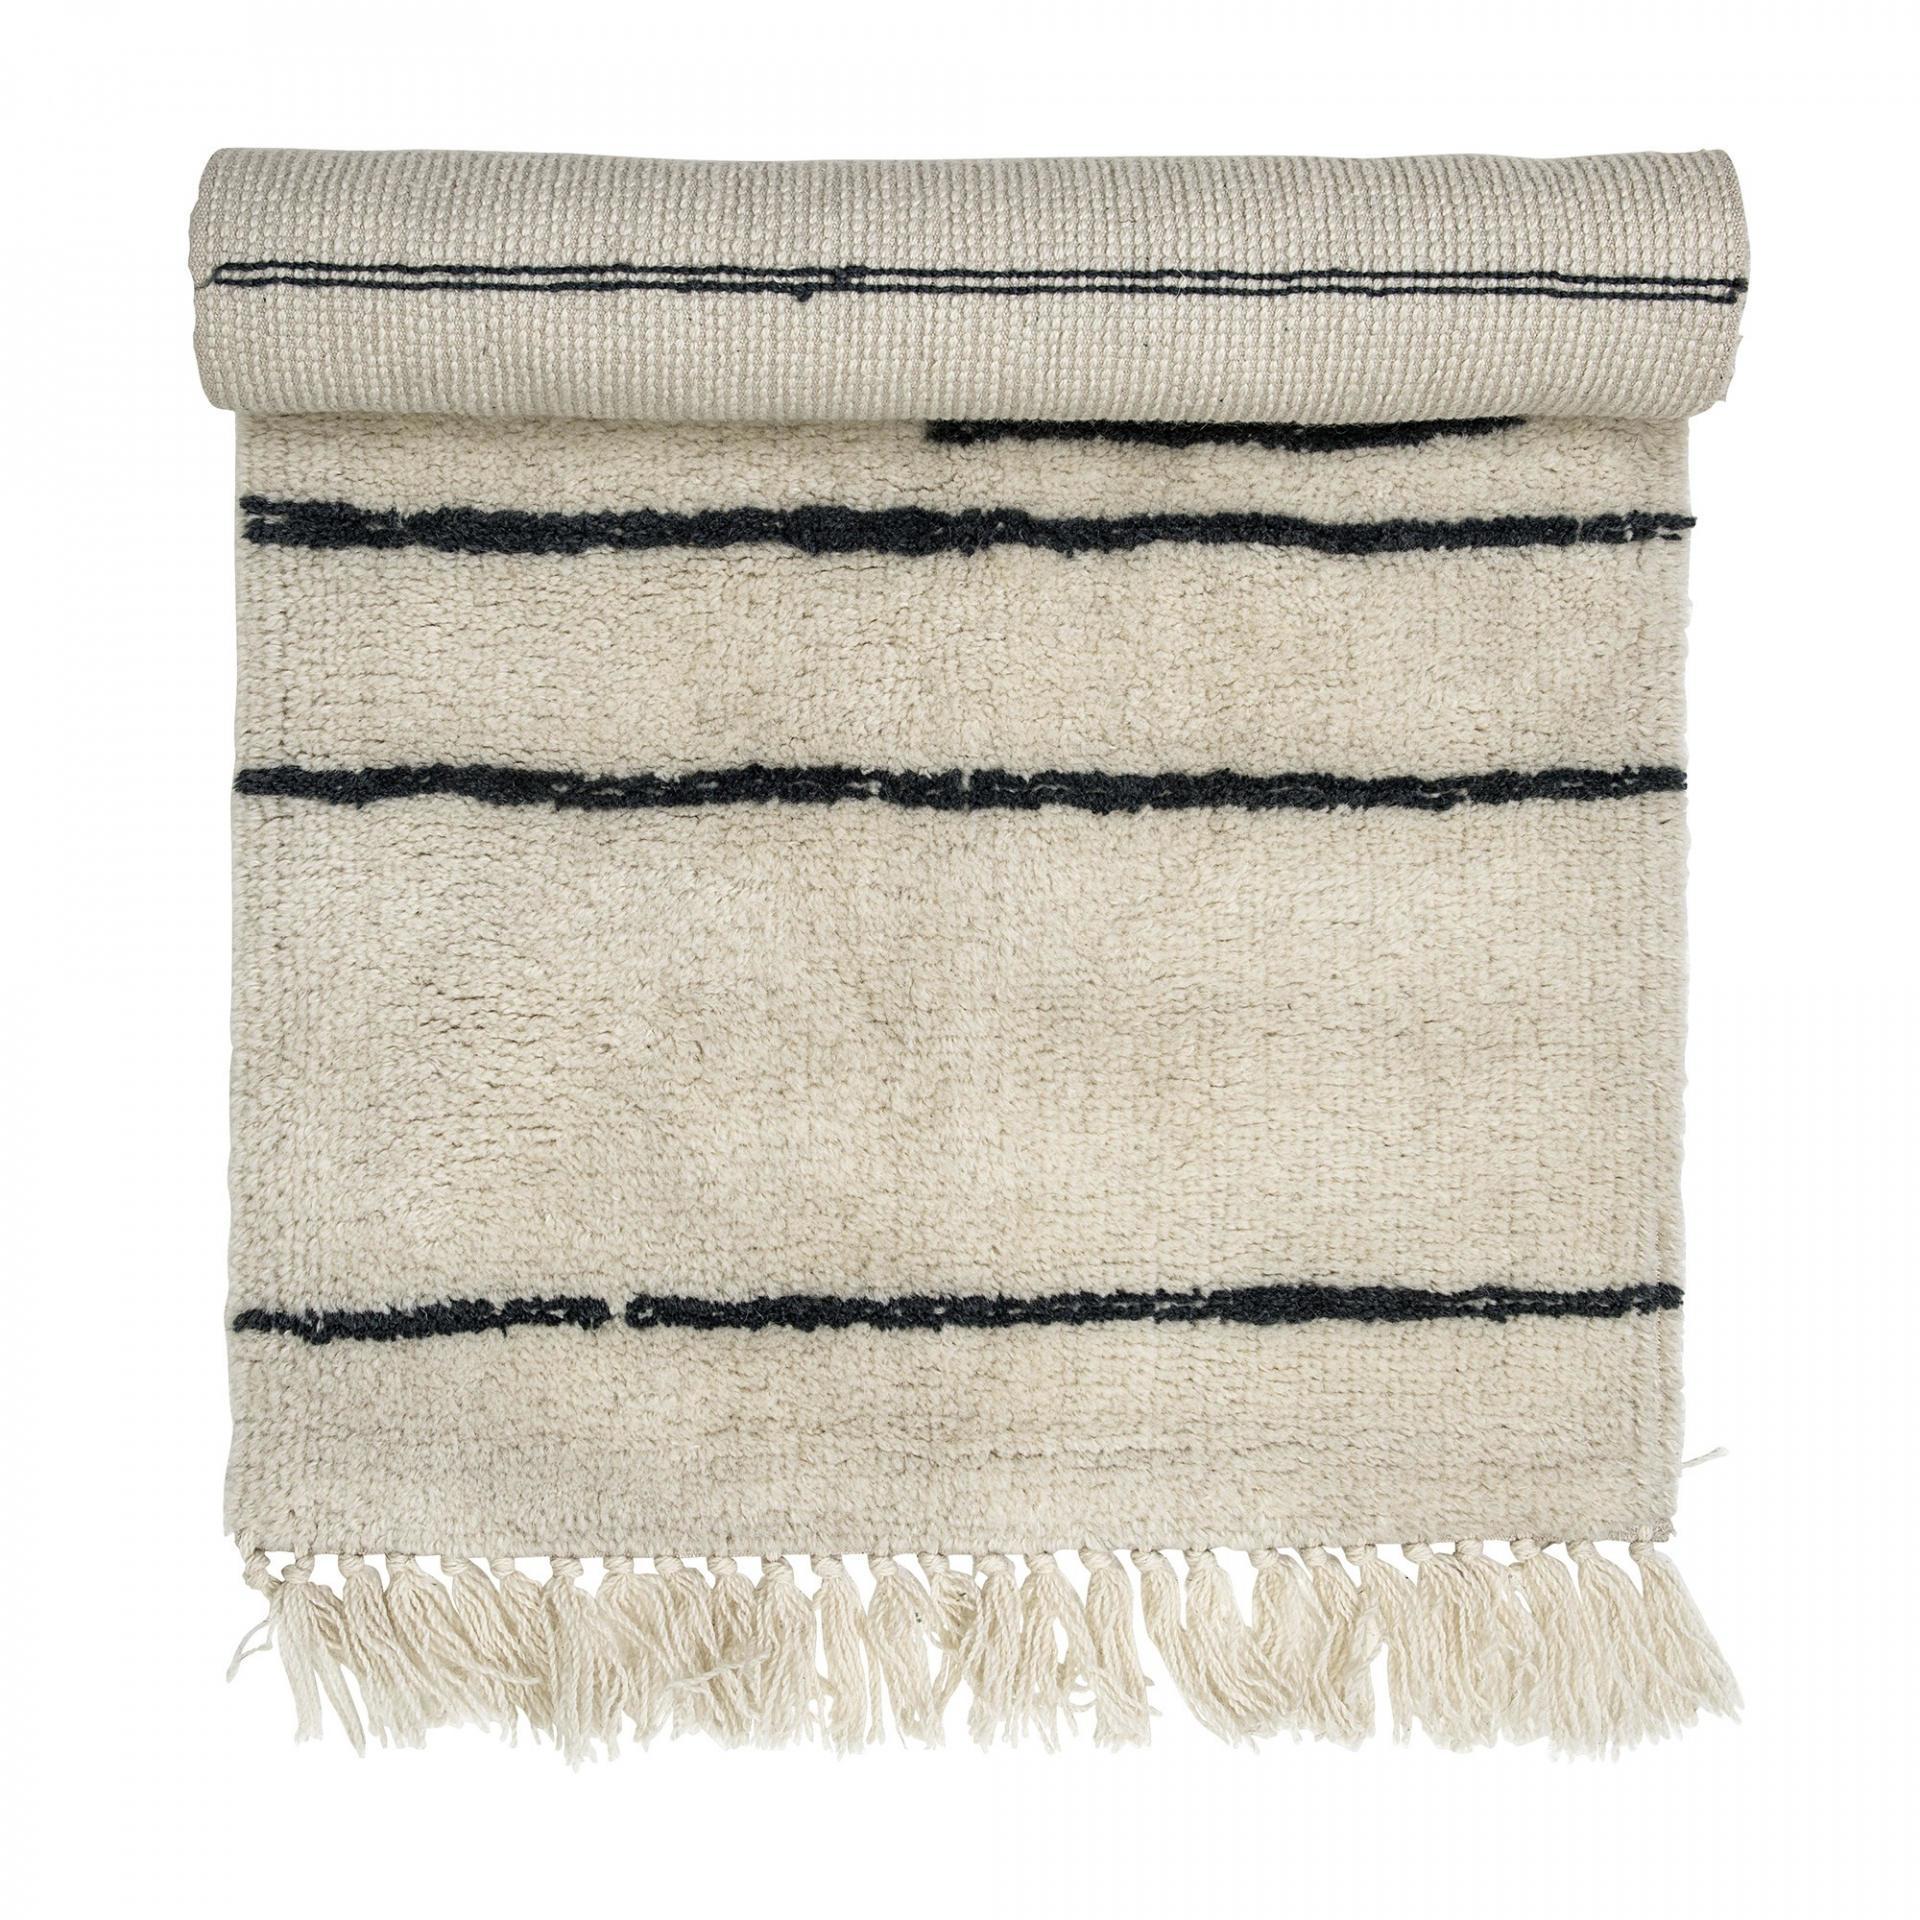 Bloomingville Vlněný koberec Line 60x120 cm, šedá barva, krémová barva, textil